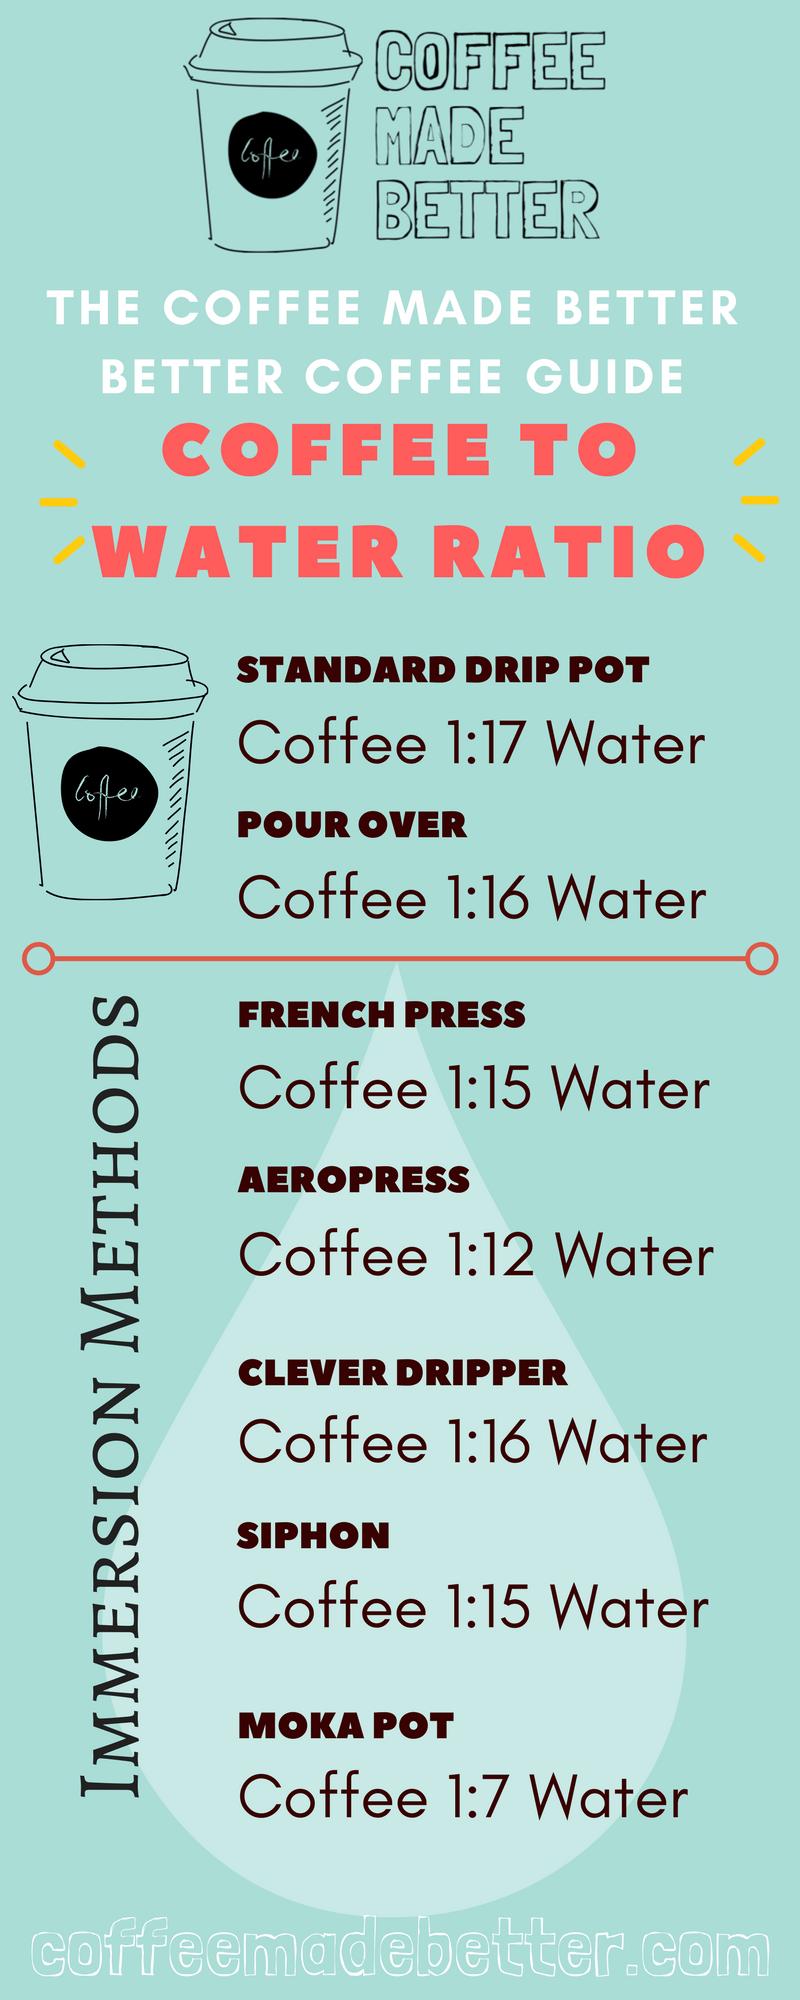 Standard Drip Pot